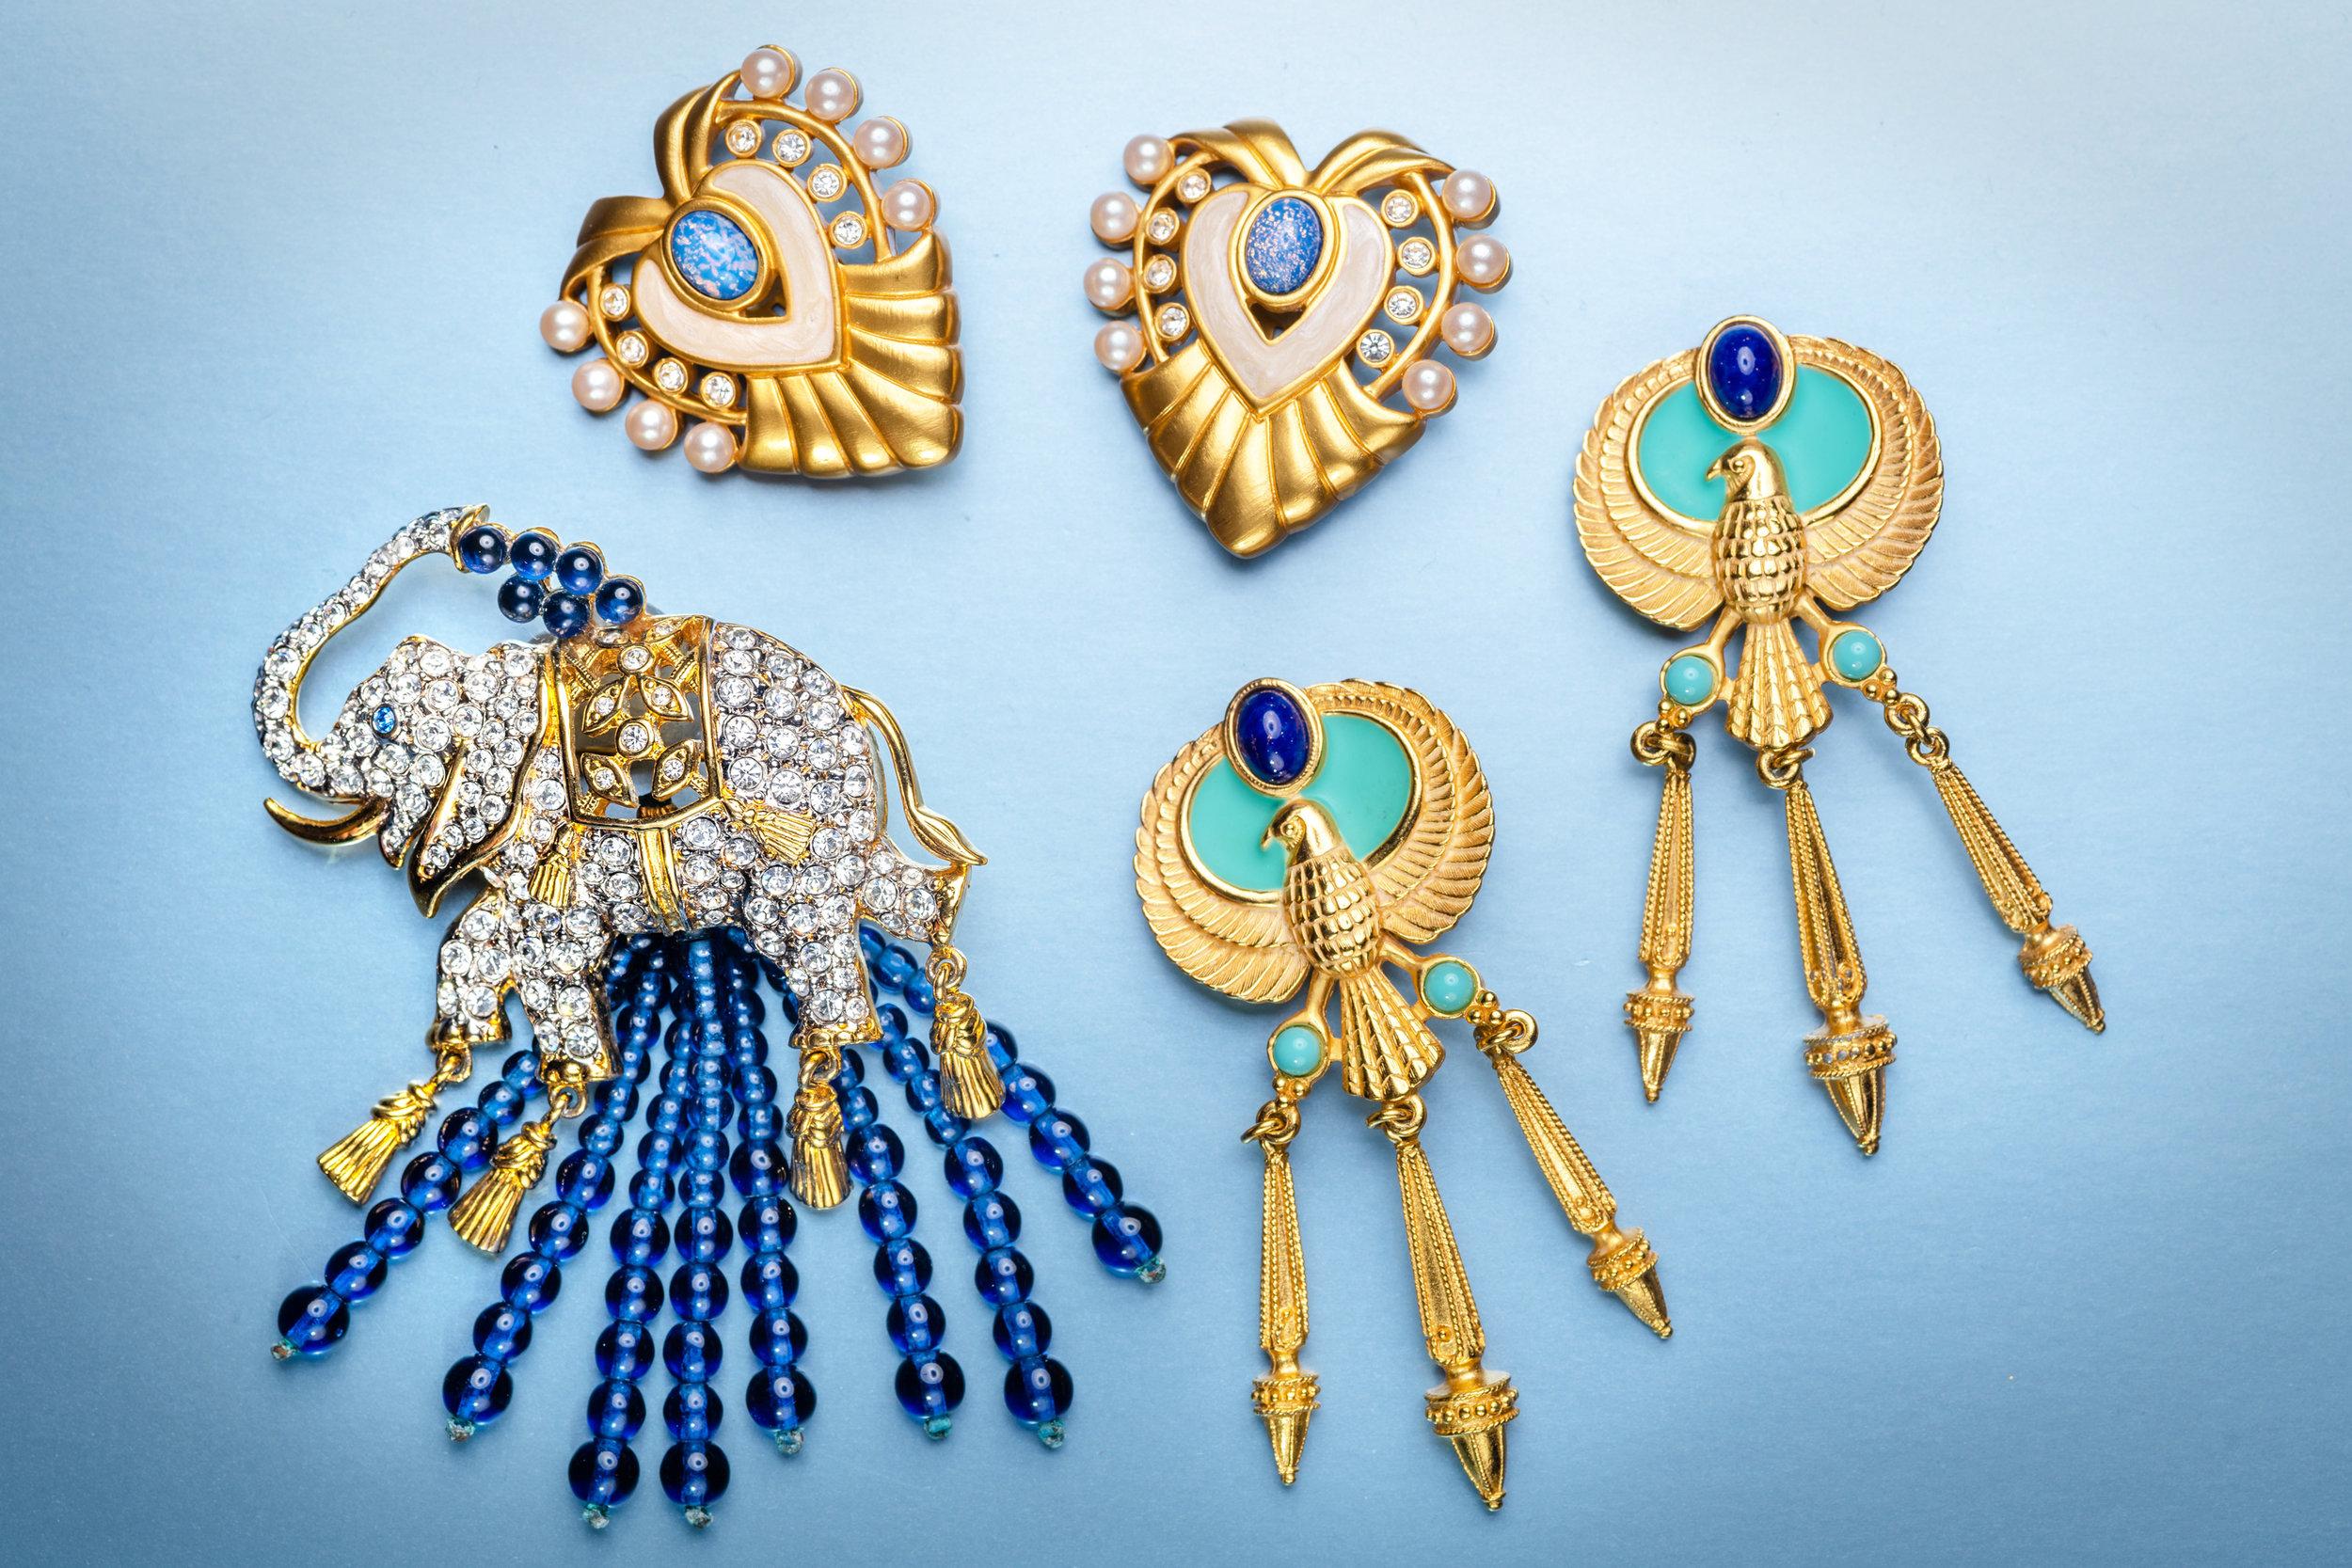 Elizabeth-Taylor-for-Avon-Collection.jpg